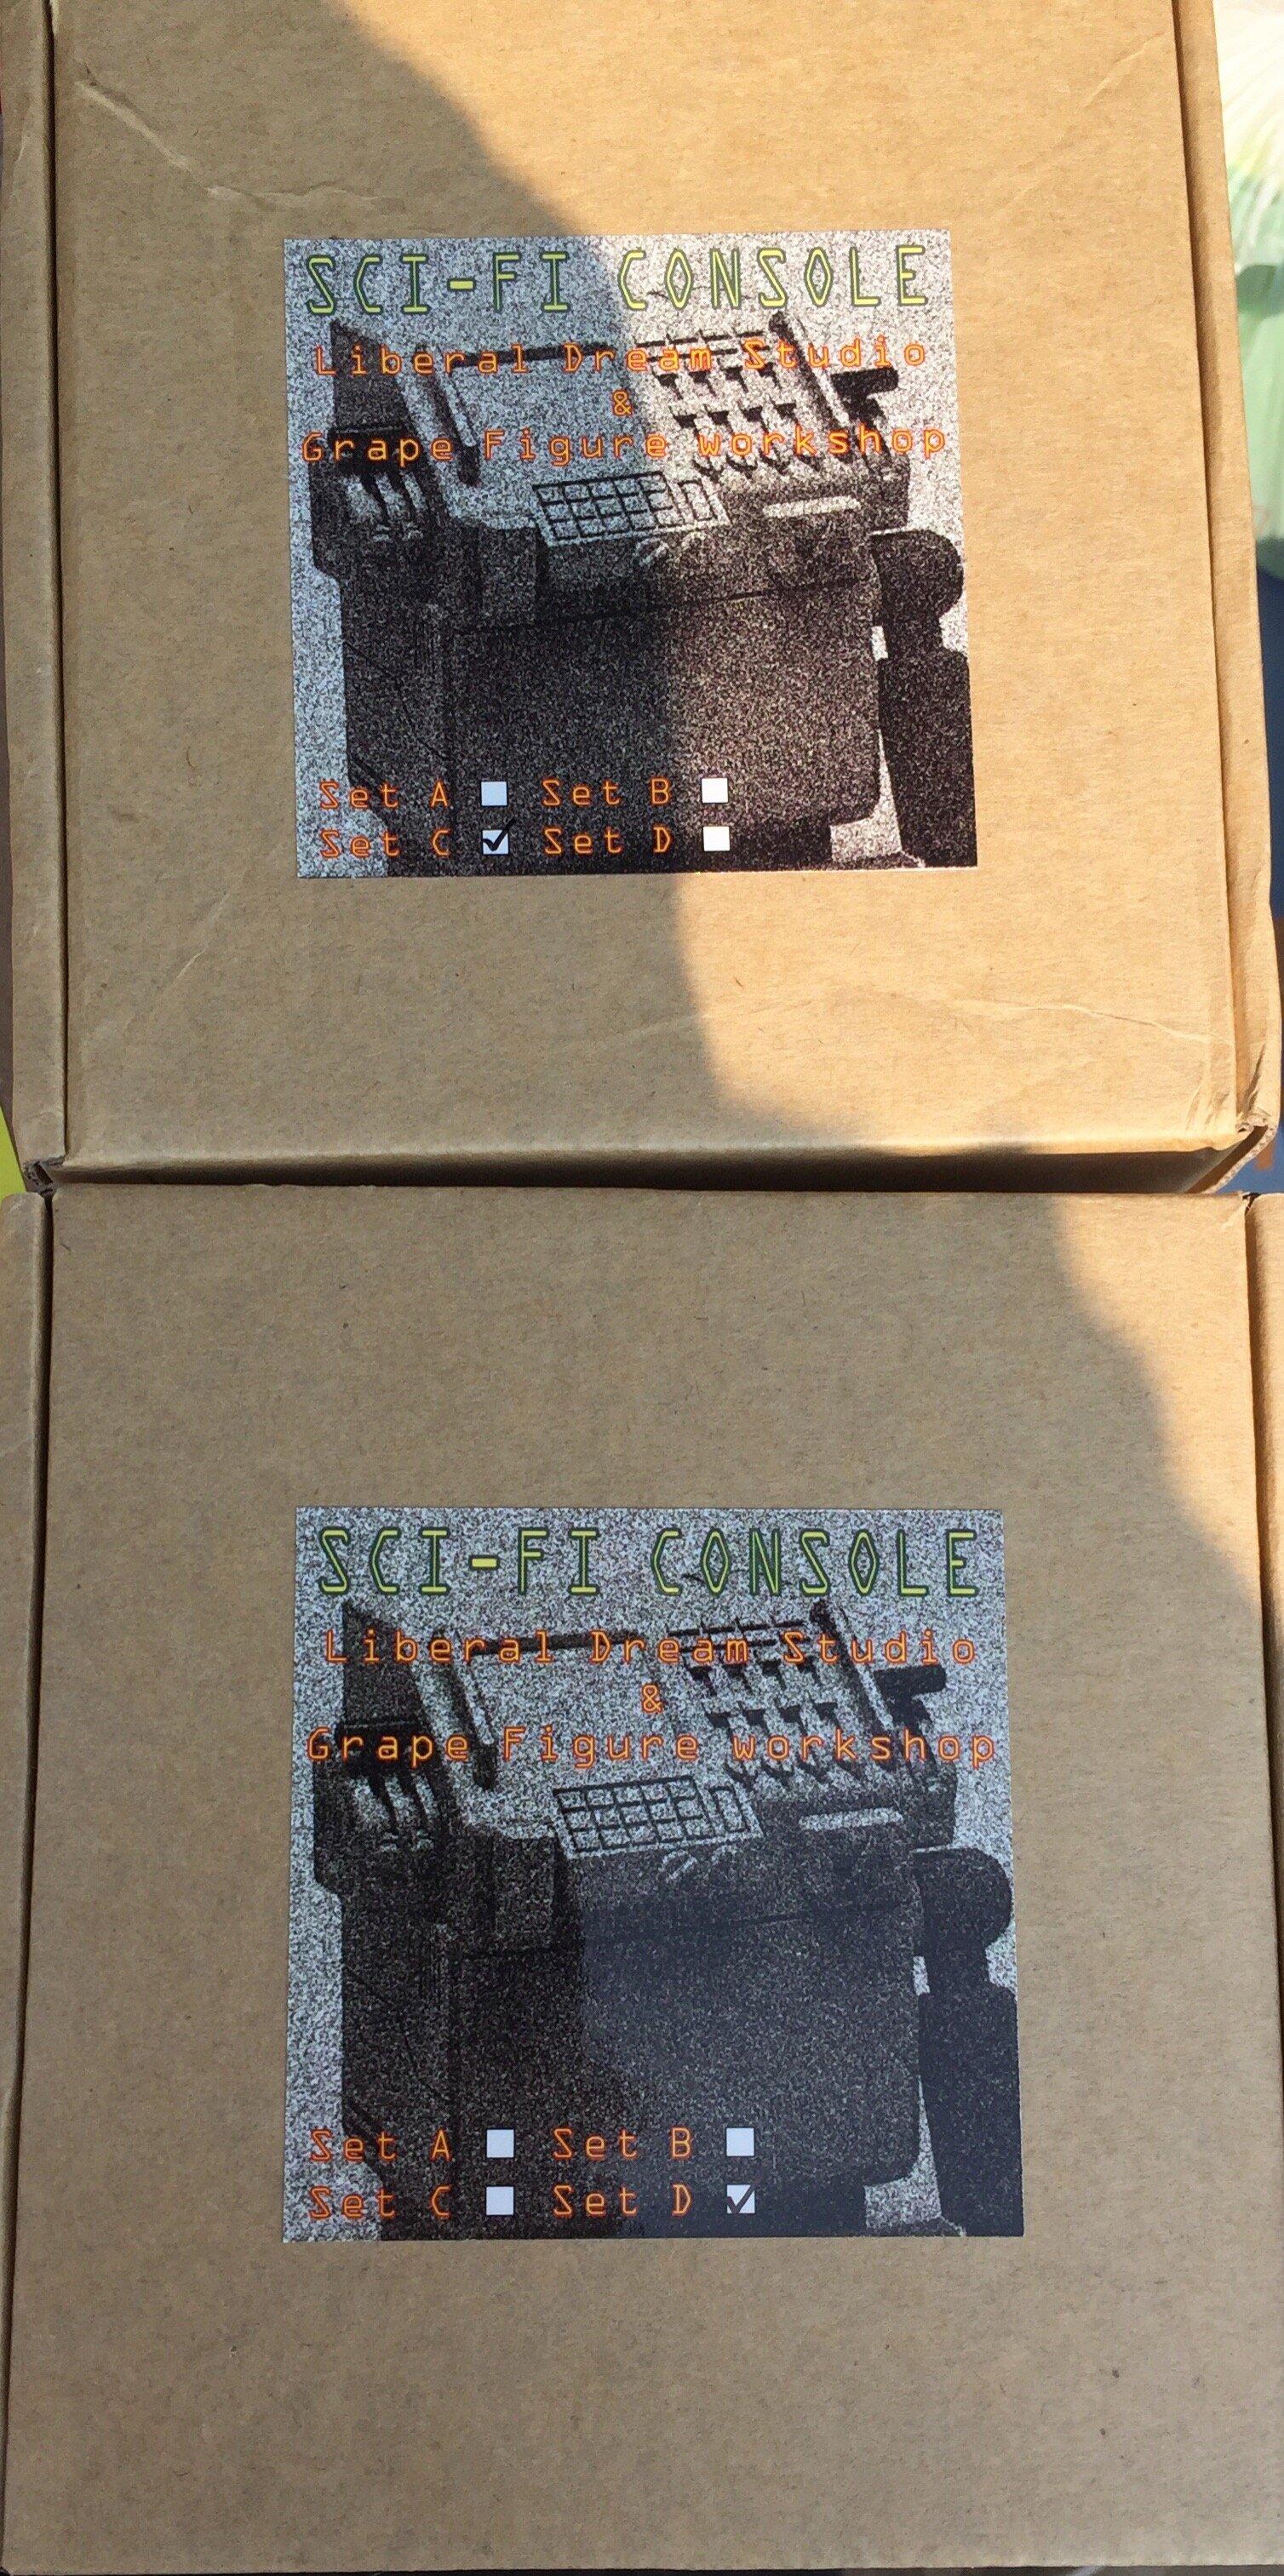 DBC3304C-4A2B-4F3E-87AC-E9925F0F1AD0.jpeg.39b56a4878d1f7481c1387f0263c94c1.jpeg